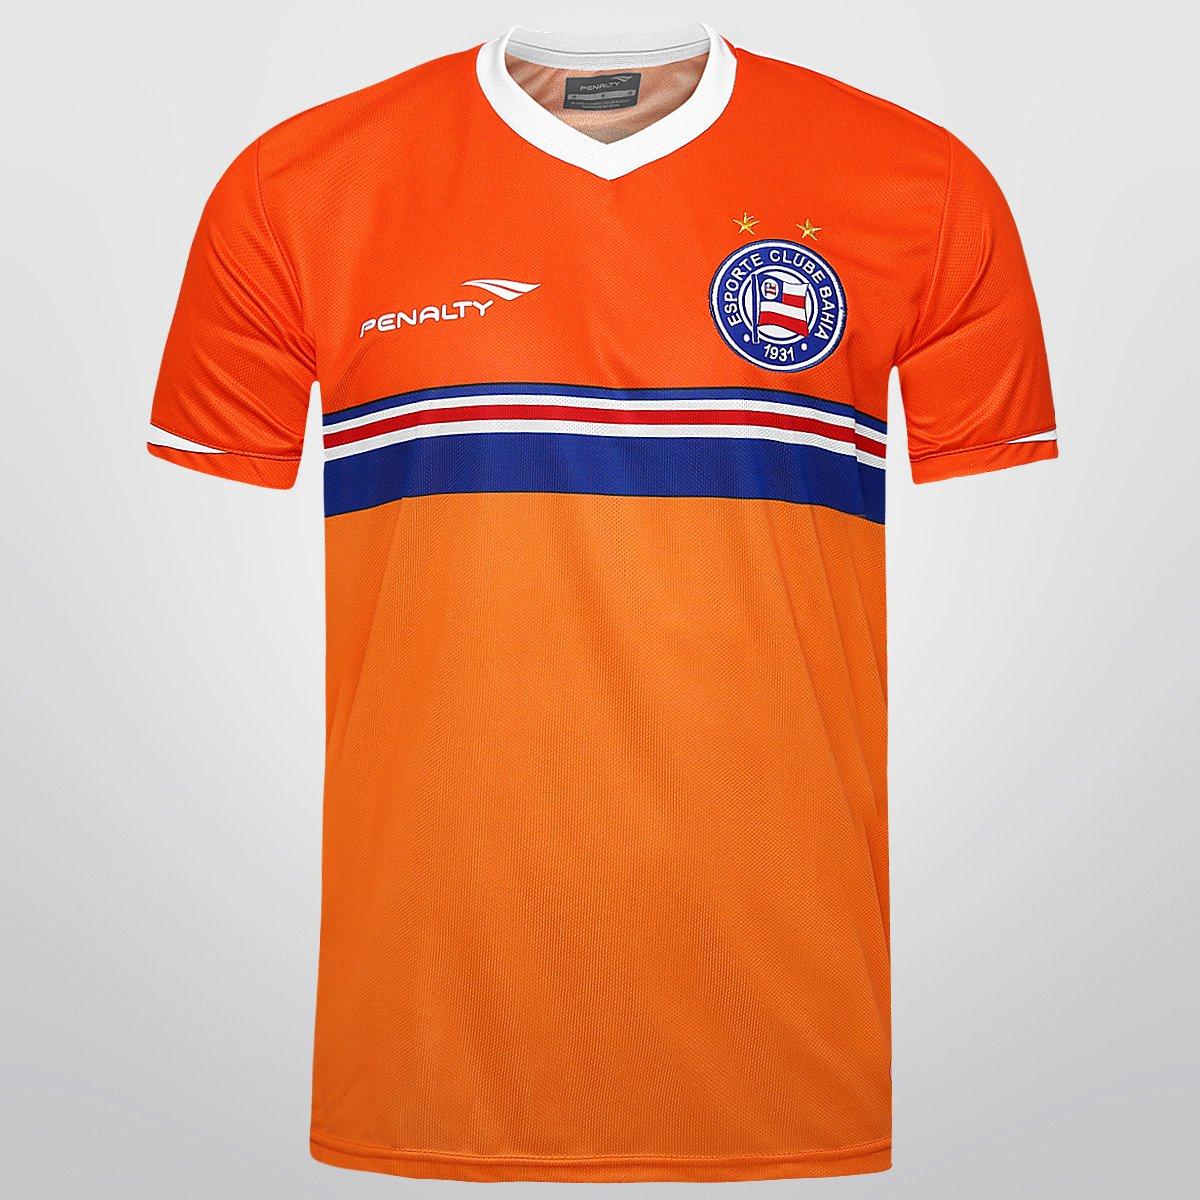 Camisa Penalty Bahia I Goleiro 2015 nº 1 - Compre Agora  7faa1be299f5c